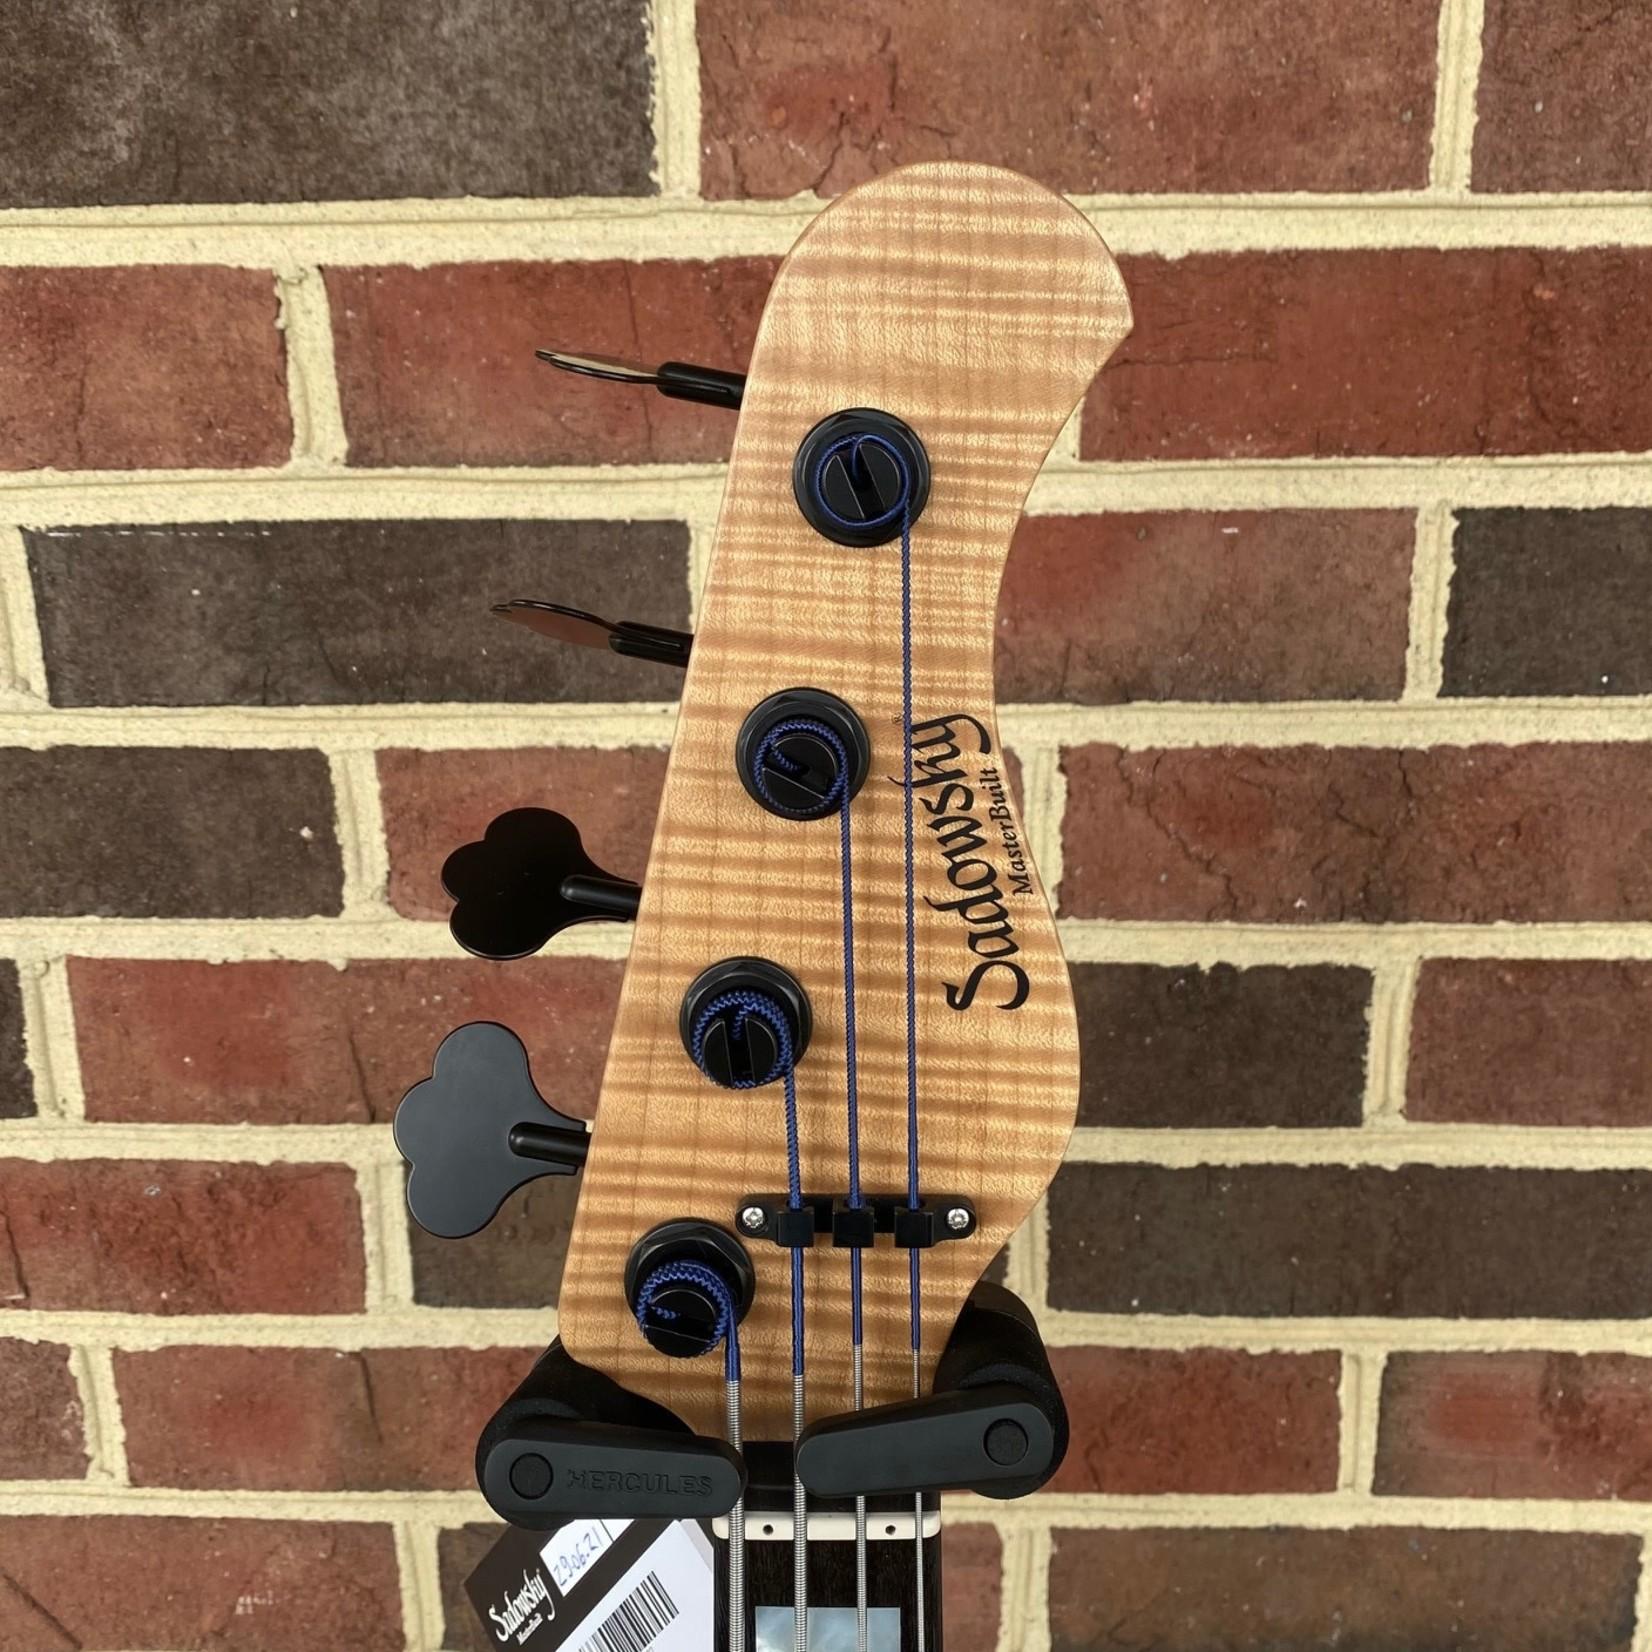 Sadowsky Sadowsky Masterbuilt 2021 LTD 24-Fret Modern, #03 of 30 Worldwide, 4-String, Wild Flame Claro Walnut Top, Okume Body, Roasted Flame Alpine Maple Neck, Mother Of Pearl Block Inlays, Black Ebony Fretboard